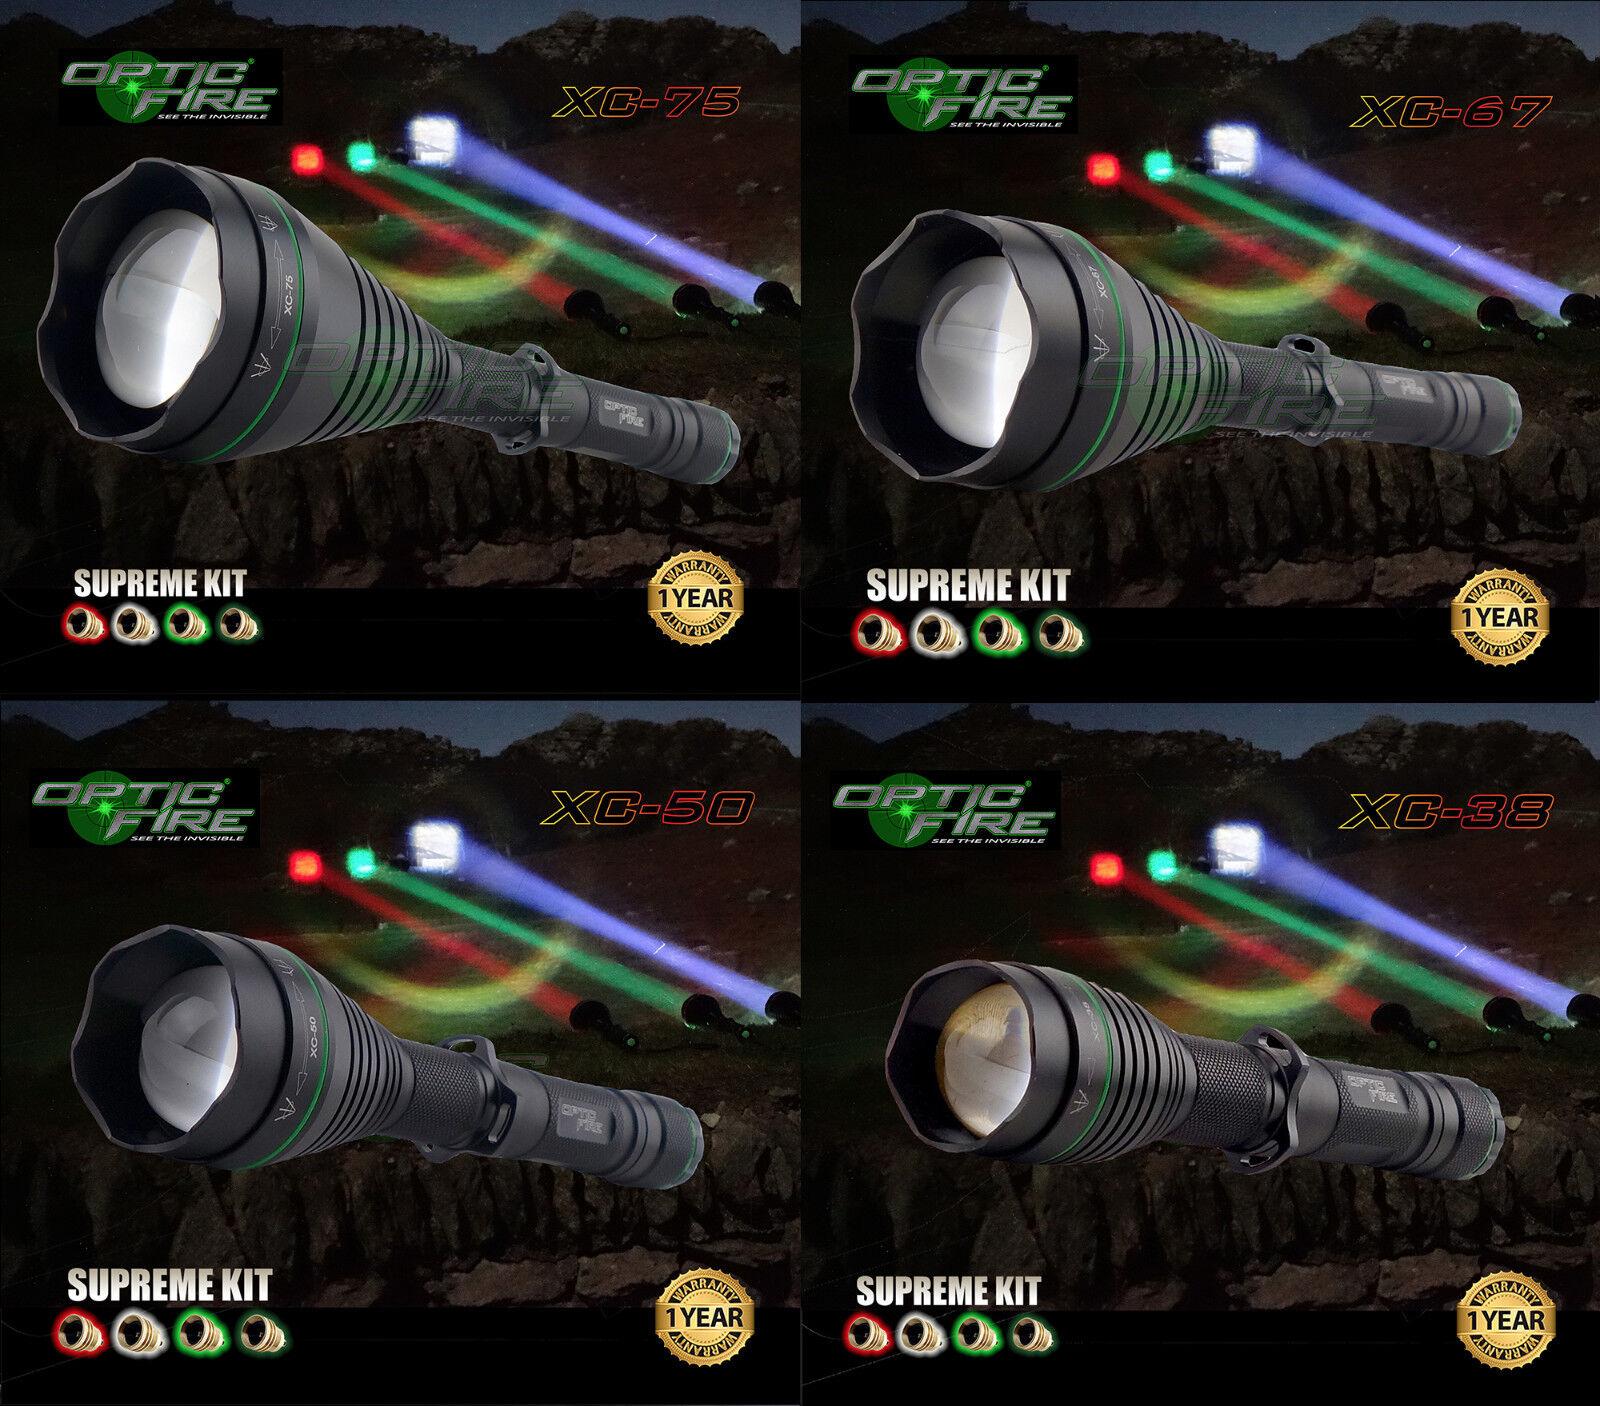 Opticfire® XC 4 LED Supreme high power hunting torch lamping lamp NV light kit